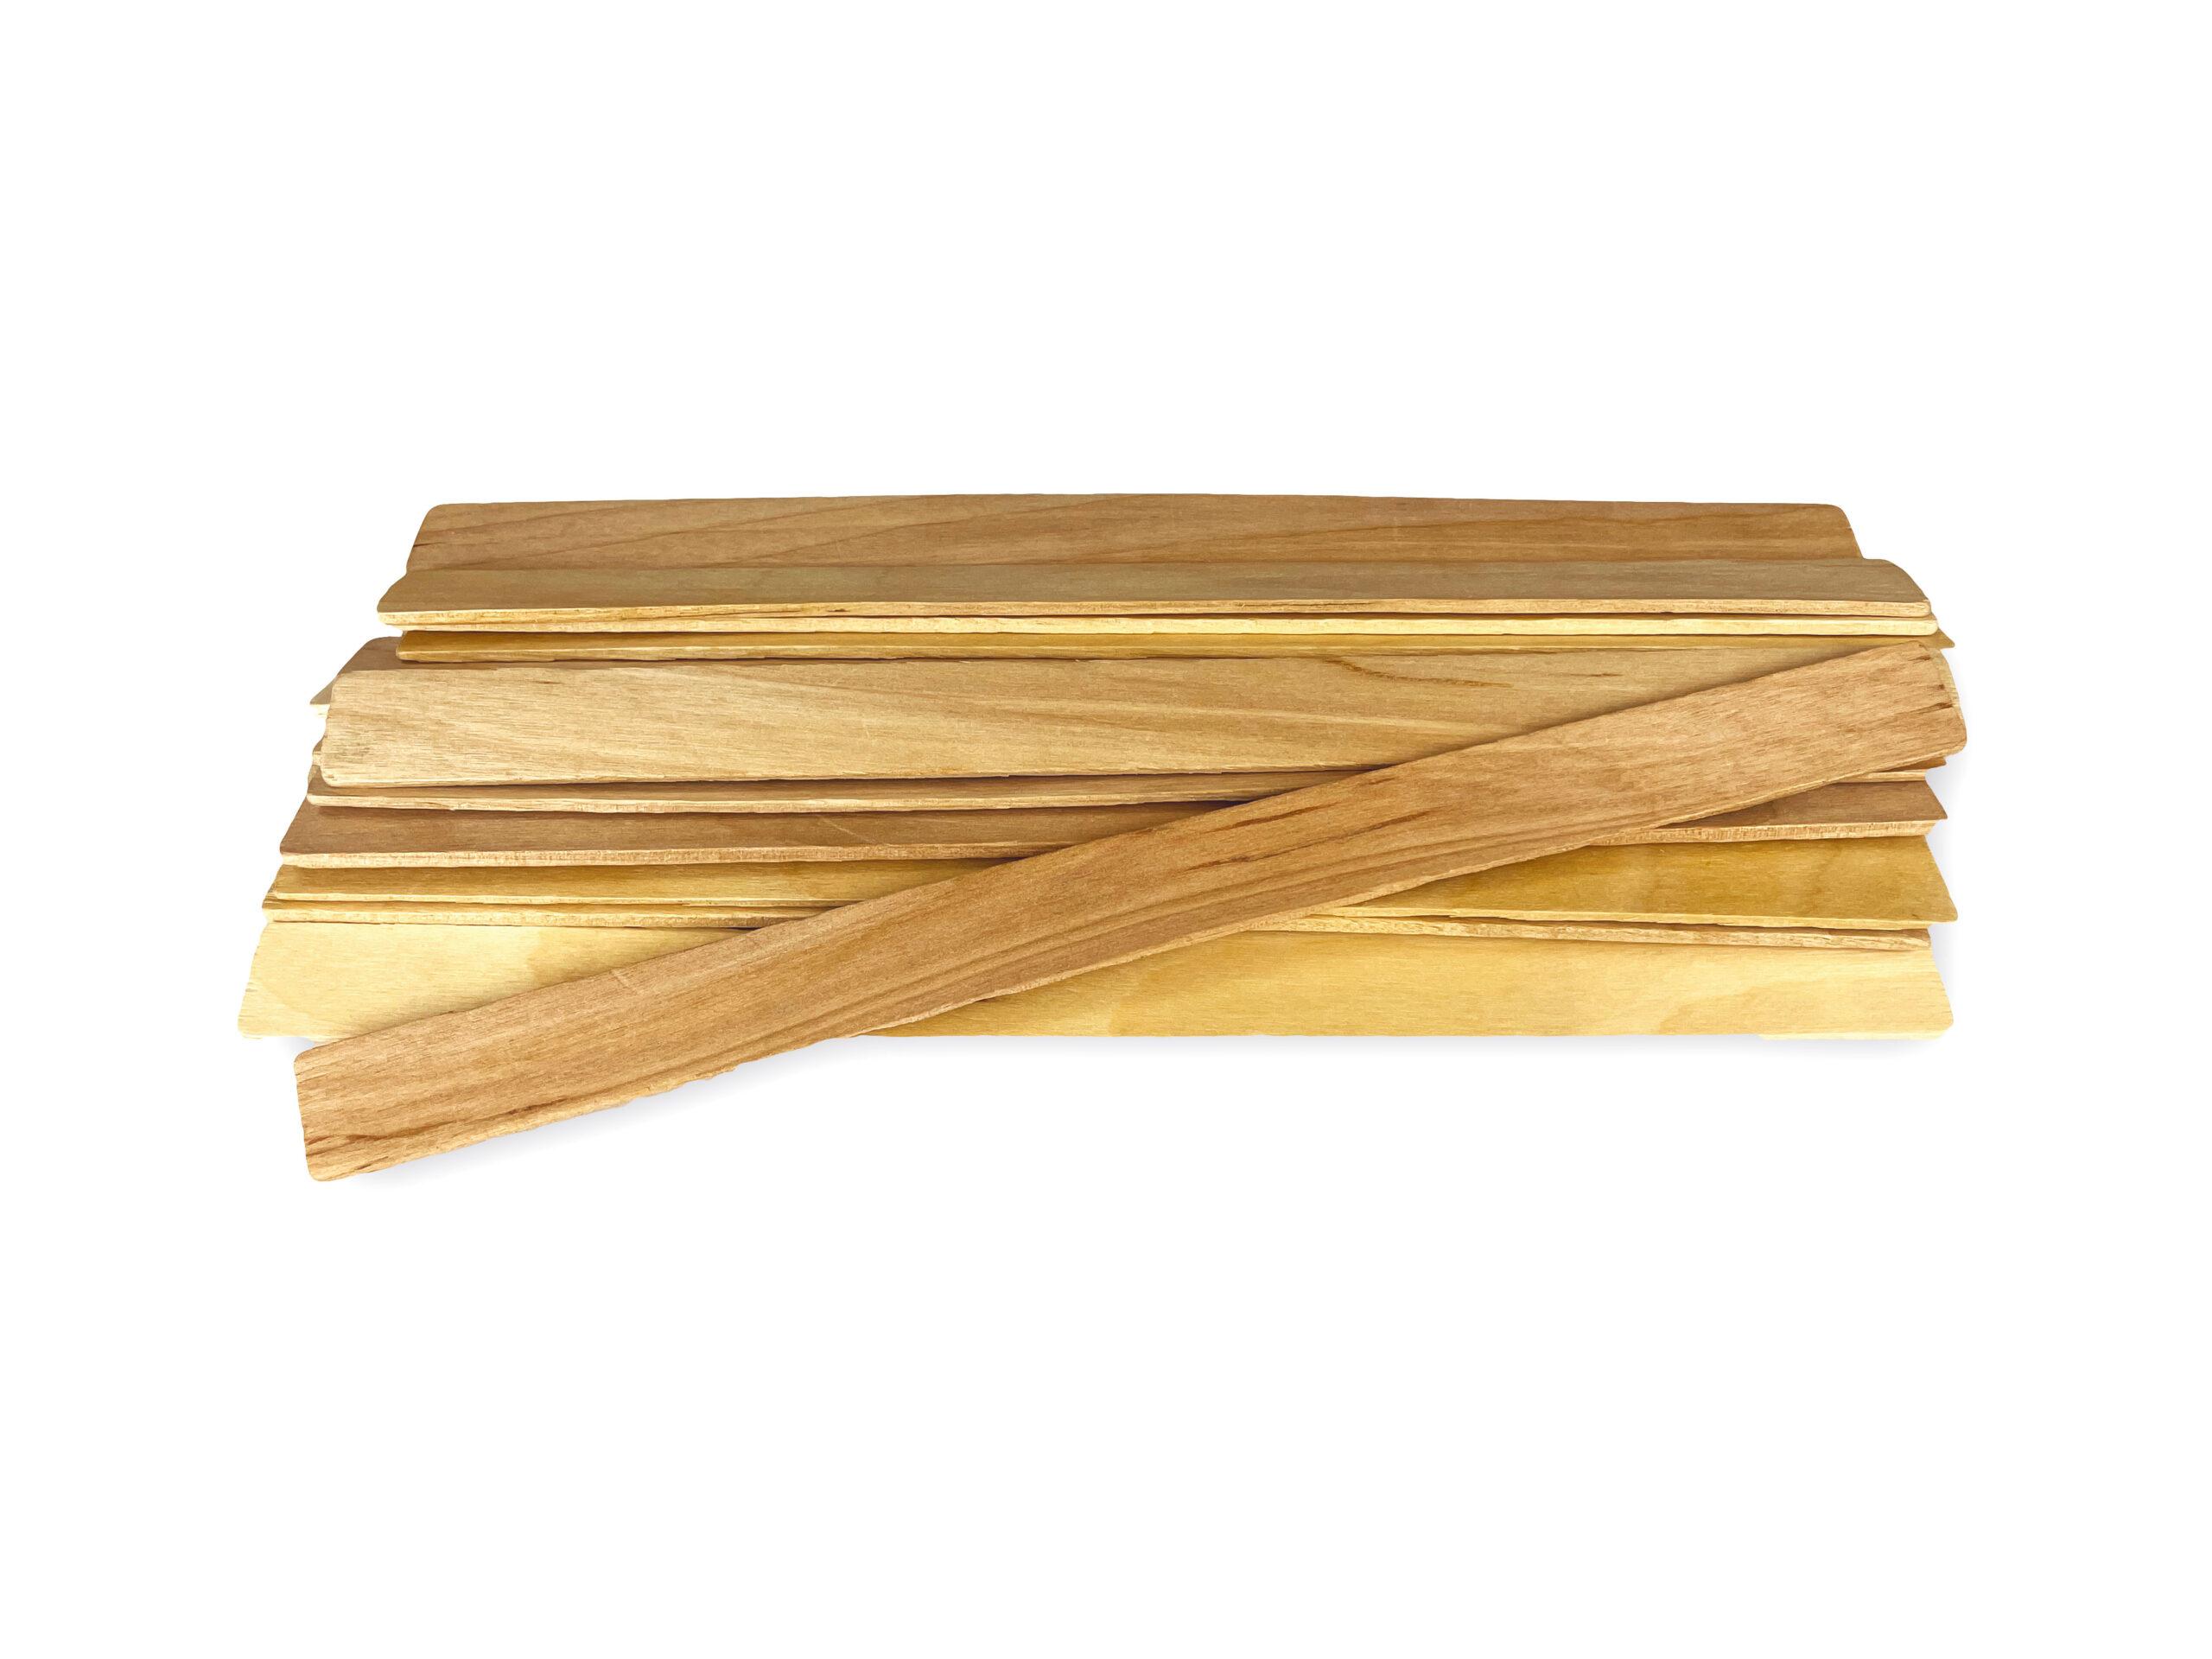 Selling Large Wooden Stir Sticks